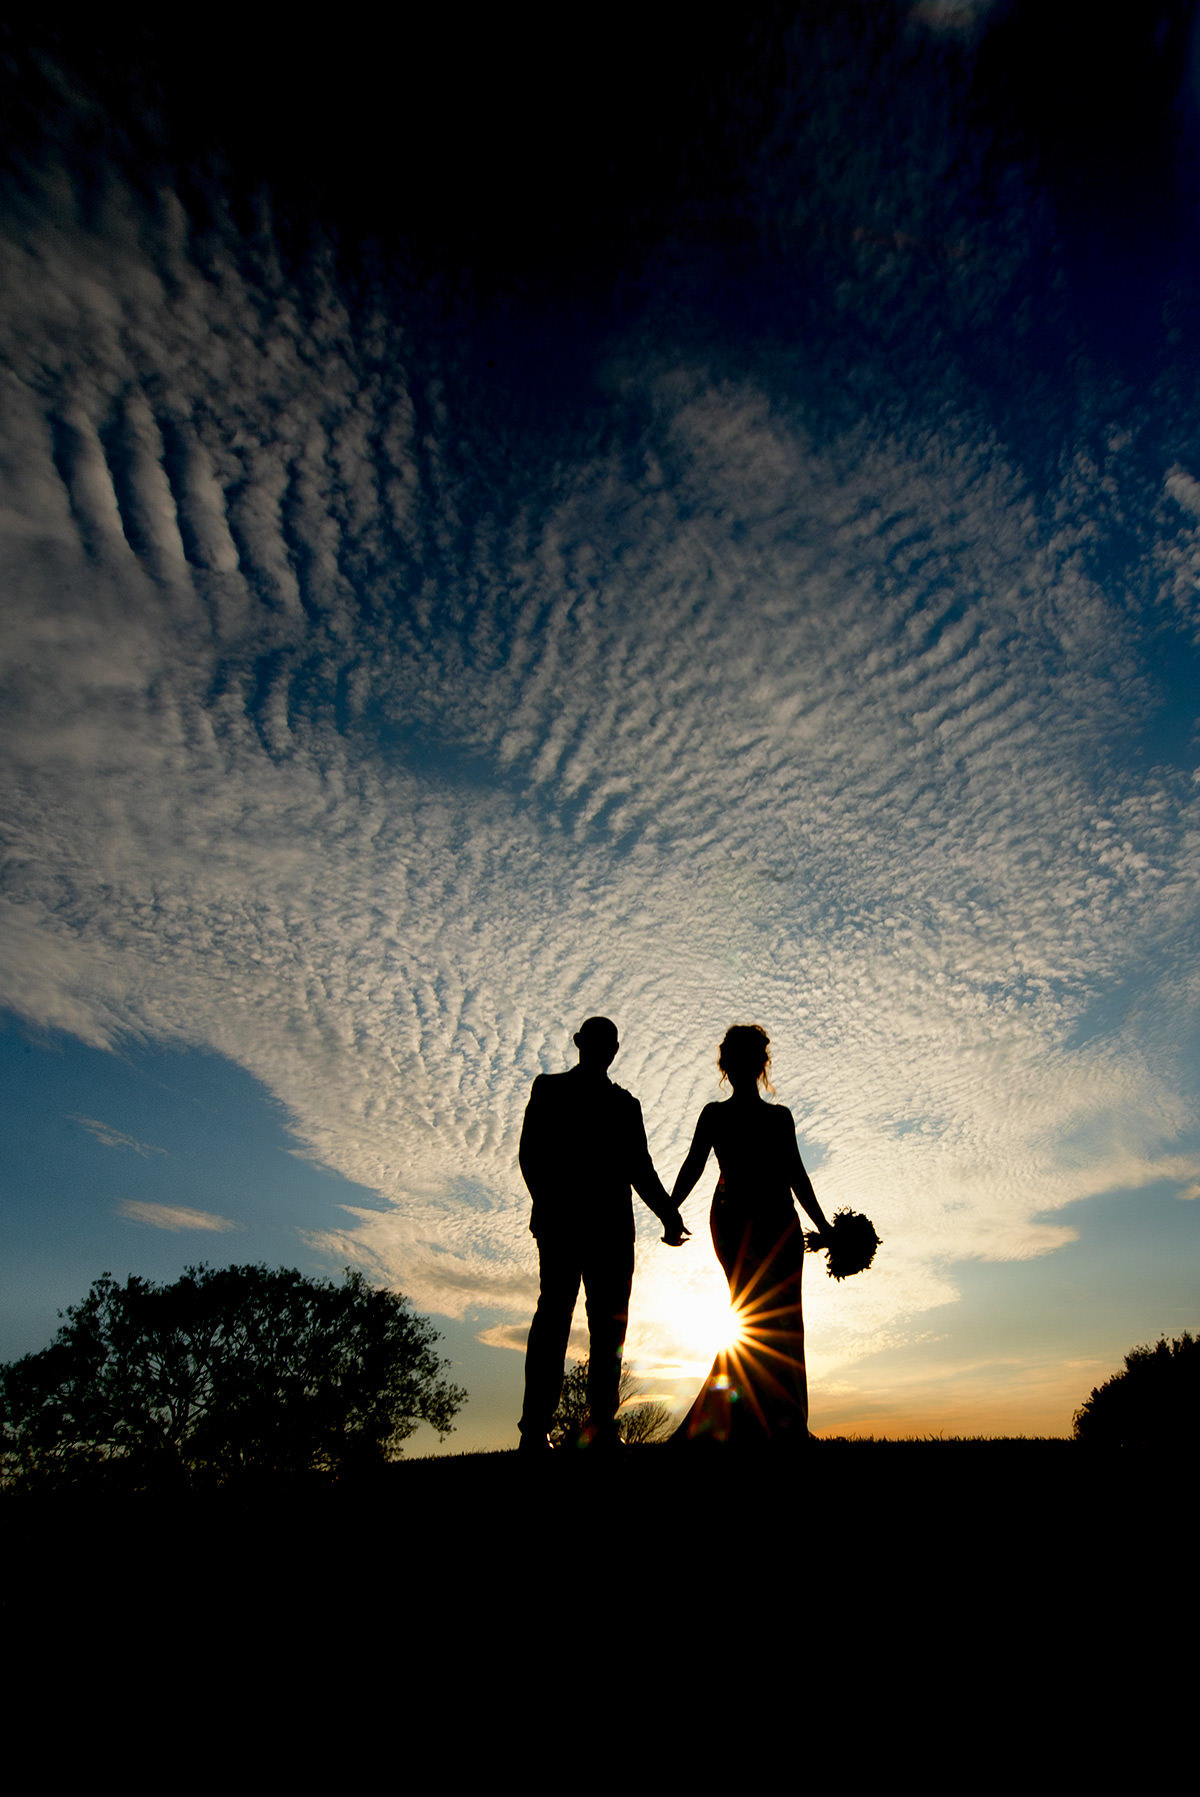 Wedding Photographer Nottingham silhouete